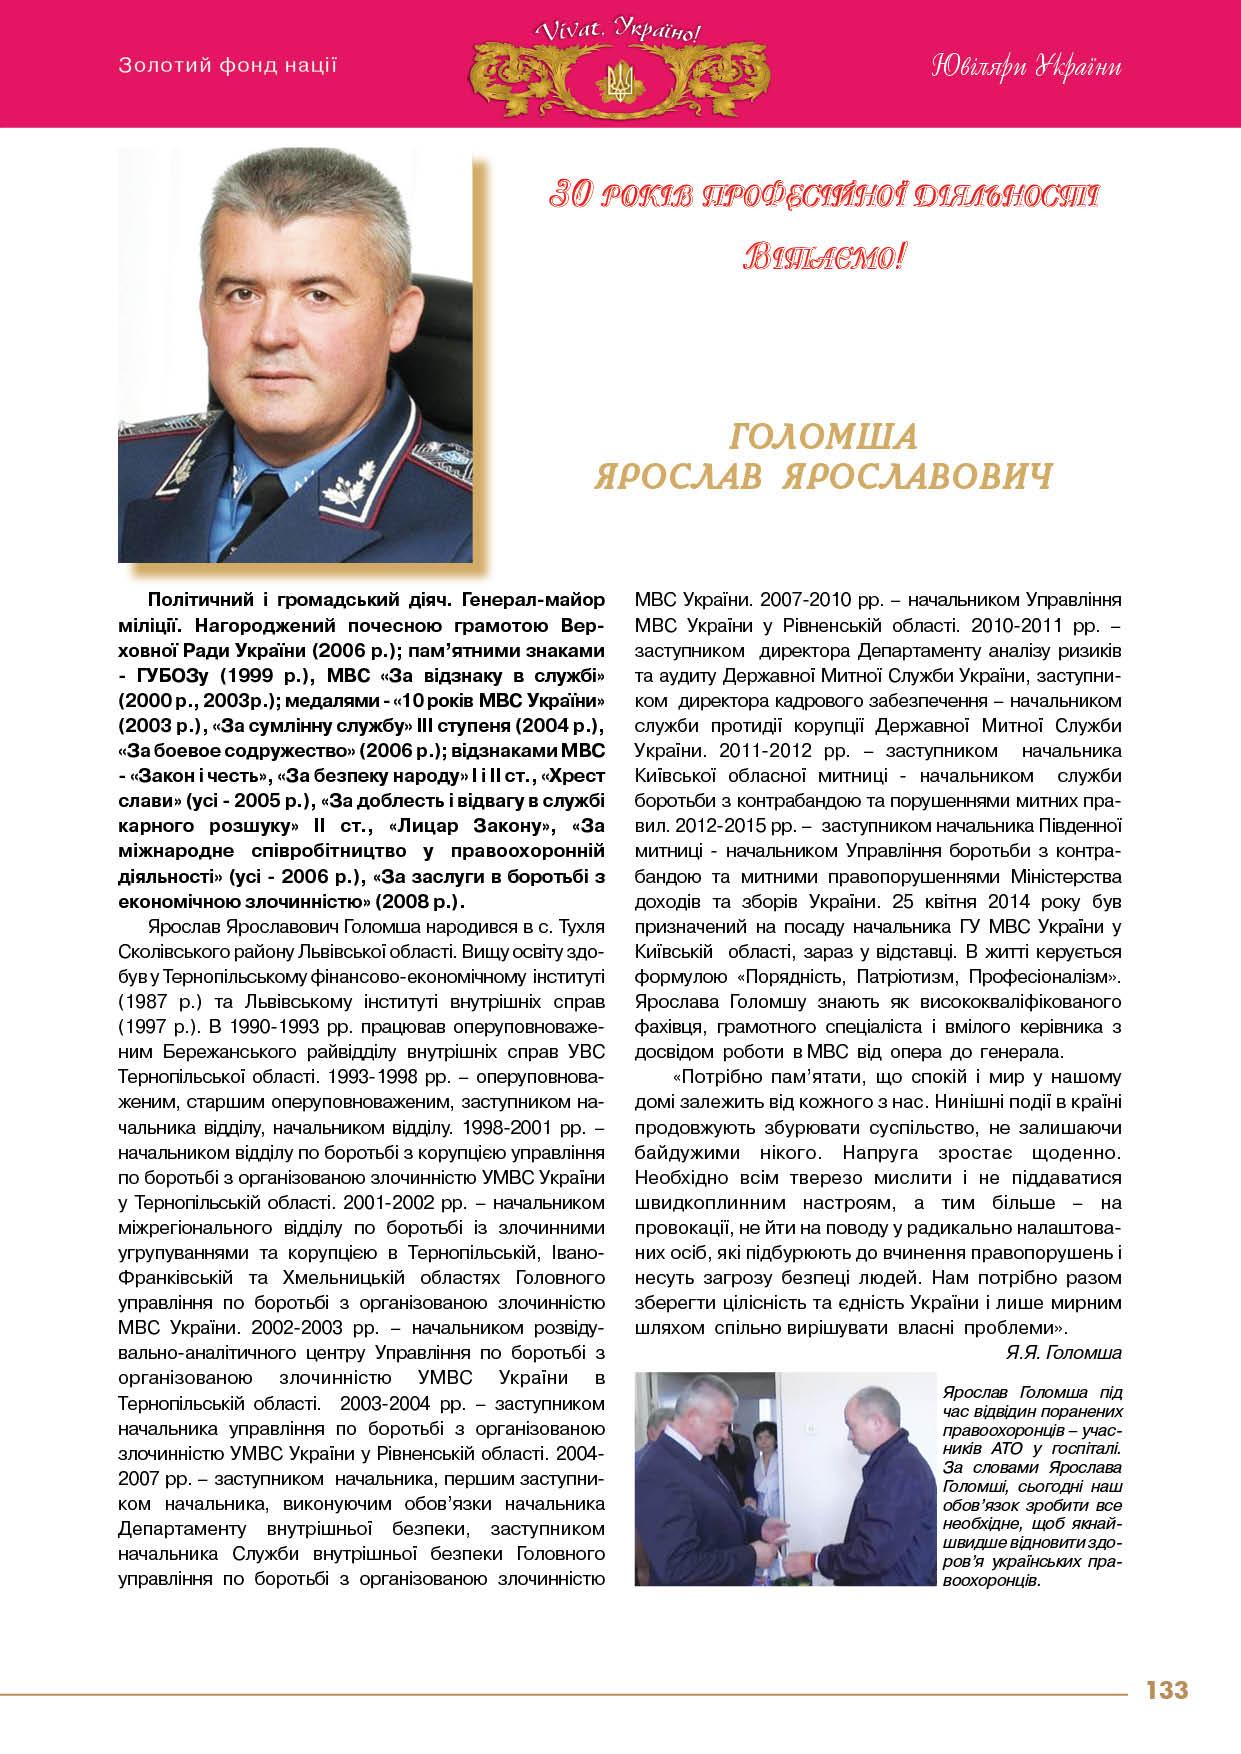 Голомша Ярослав Ярославович